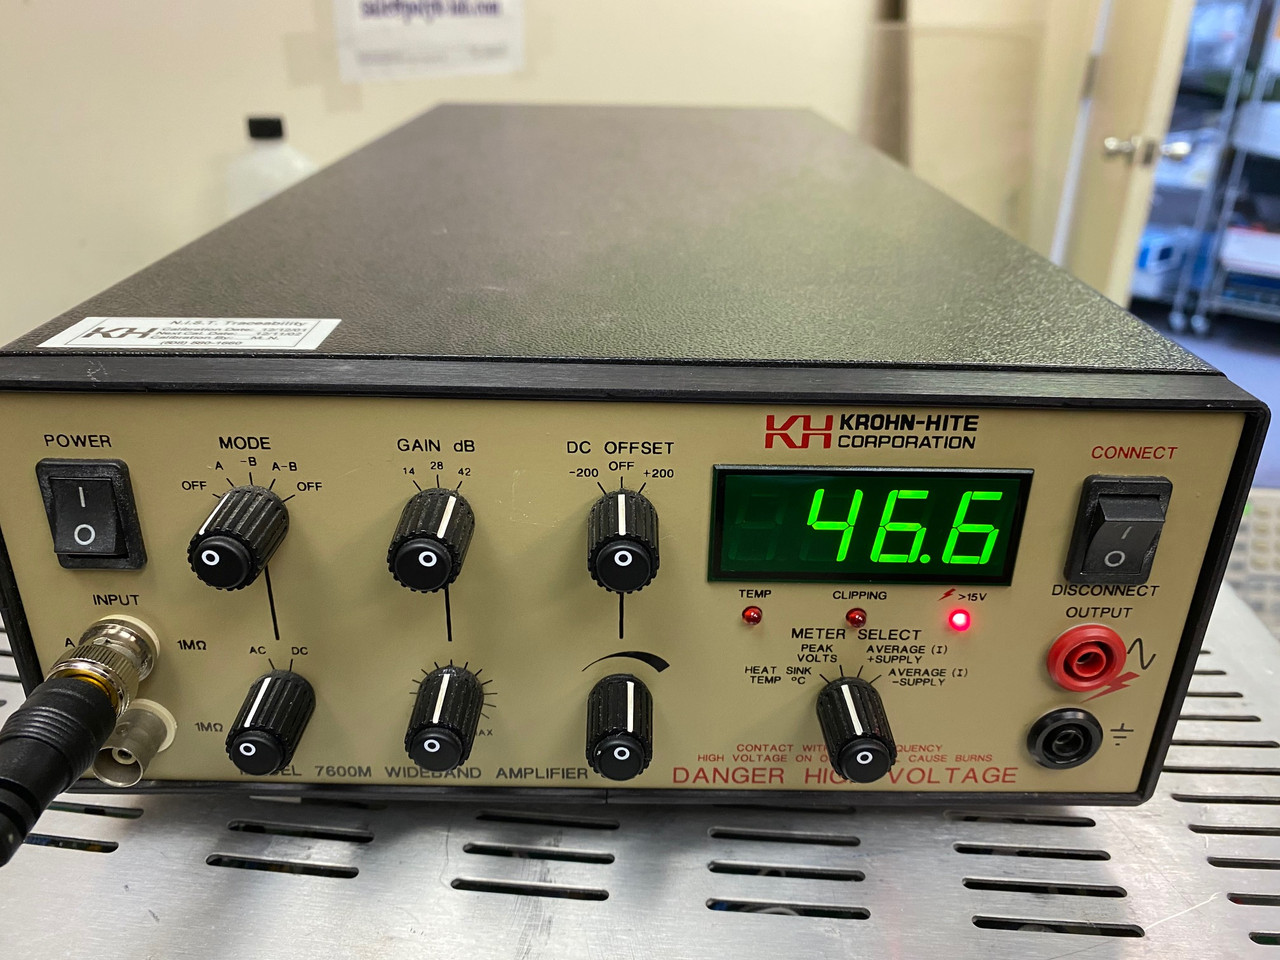 Krohn-Hite Models 7600M Wide Band High Frequency Power Amplifier +/-200 V 1 MHz